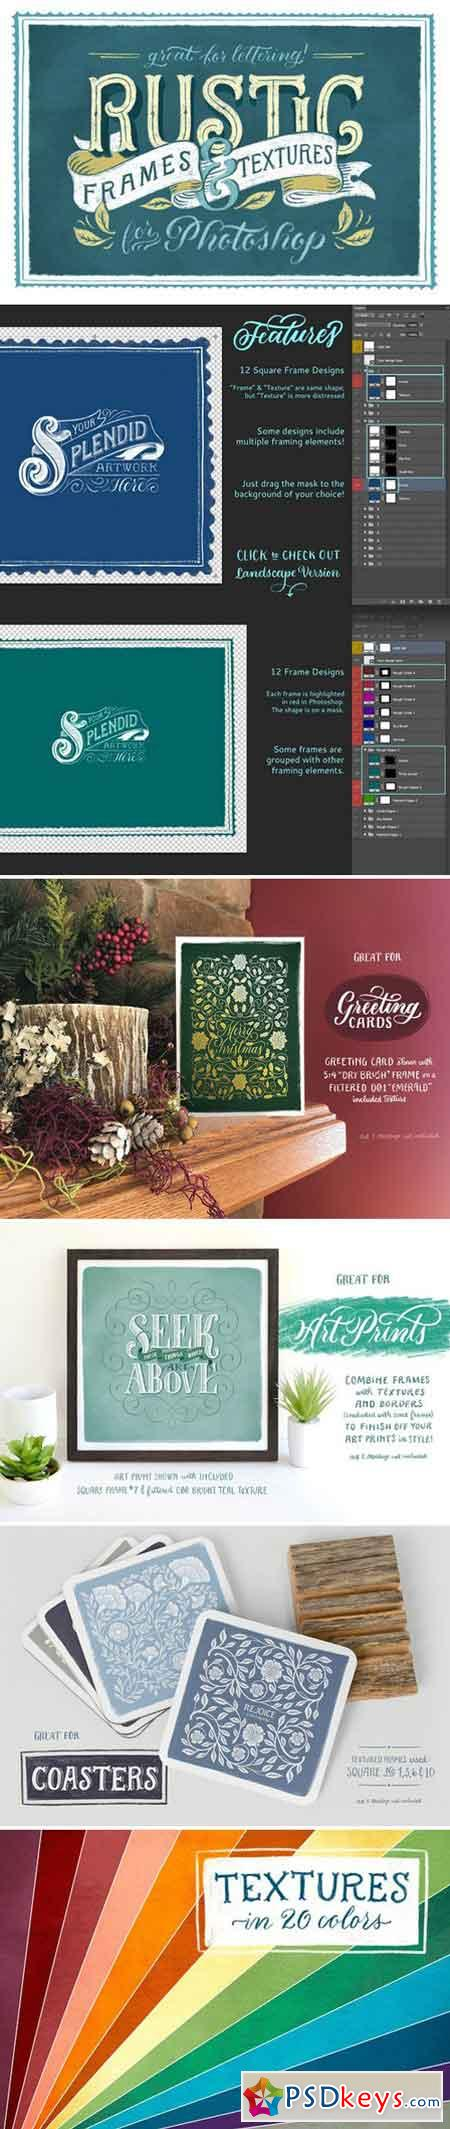 Rustic Frames & Textures - Photoshop 2222041